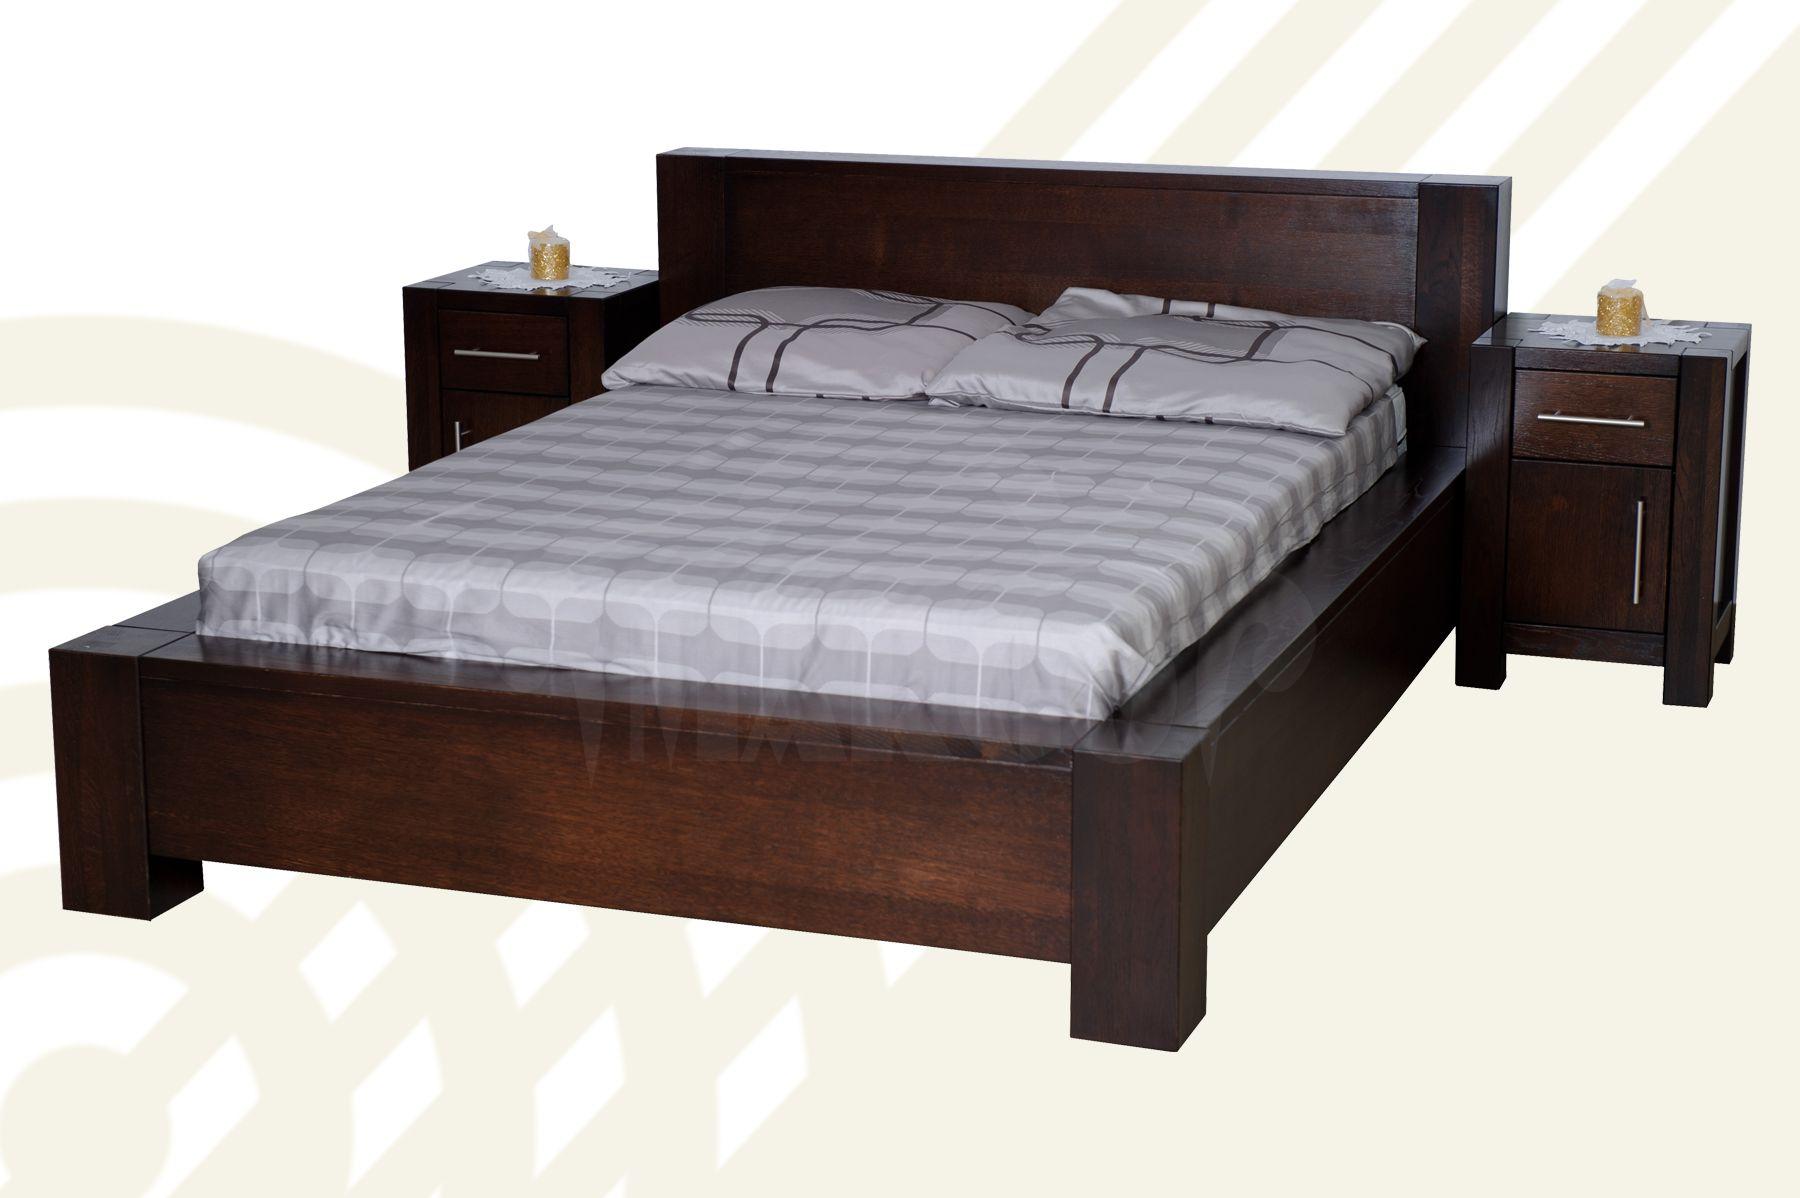 Dubová postel Boss